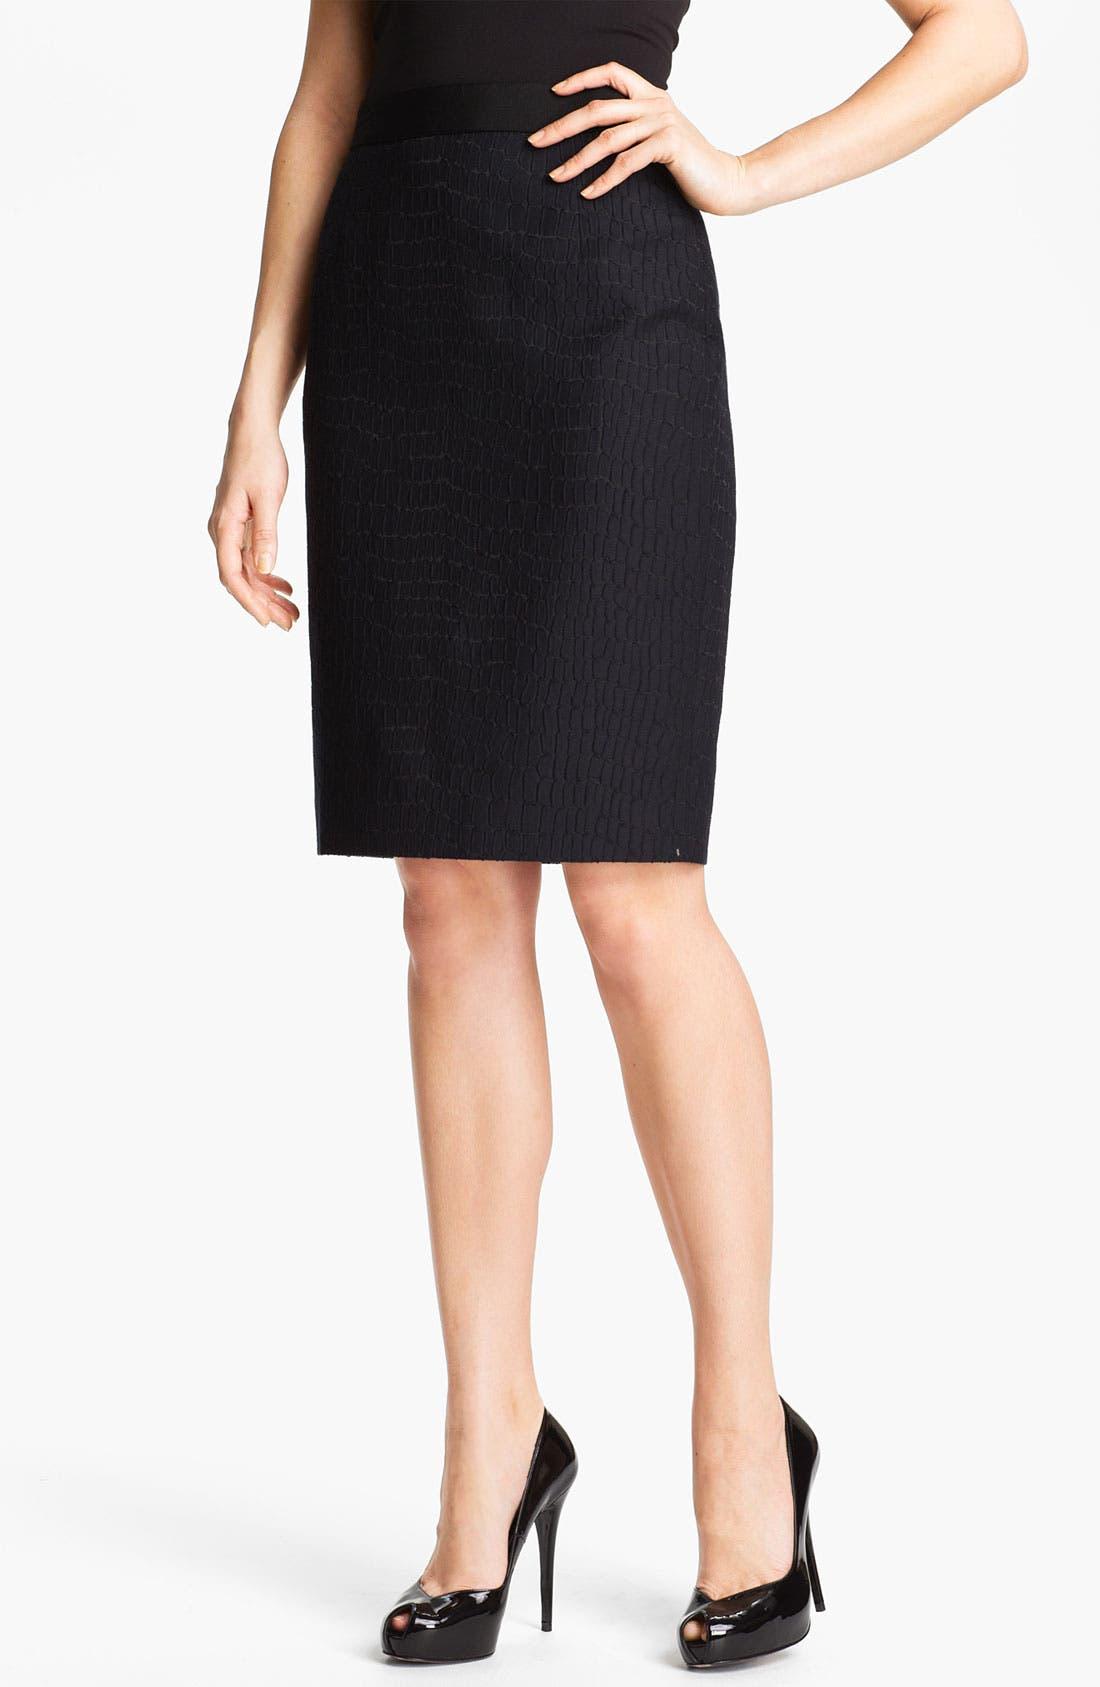 Alternate Image 1 Selected - Classiques Entier® 'Dahlia Jacquard' Skirt